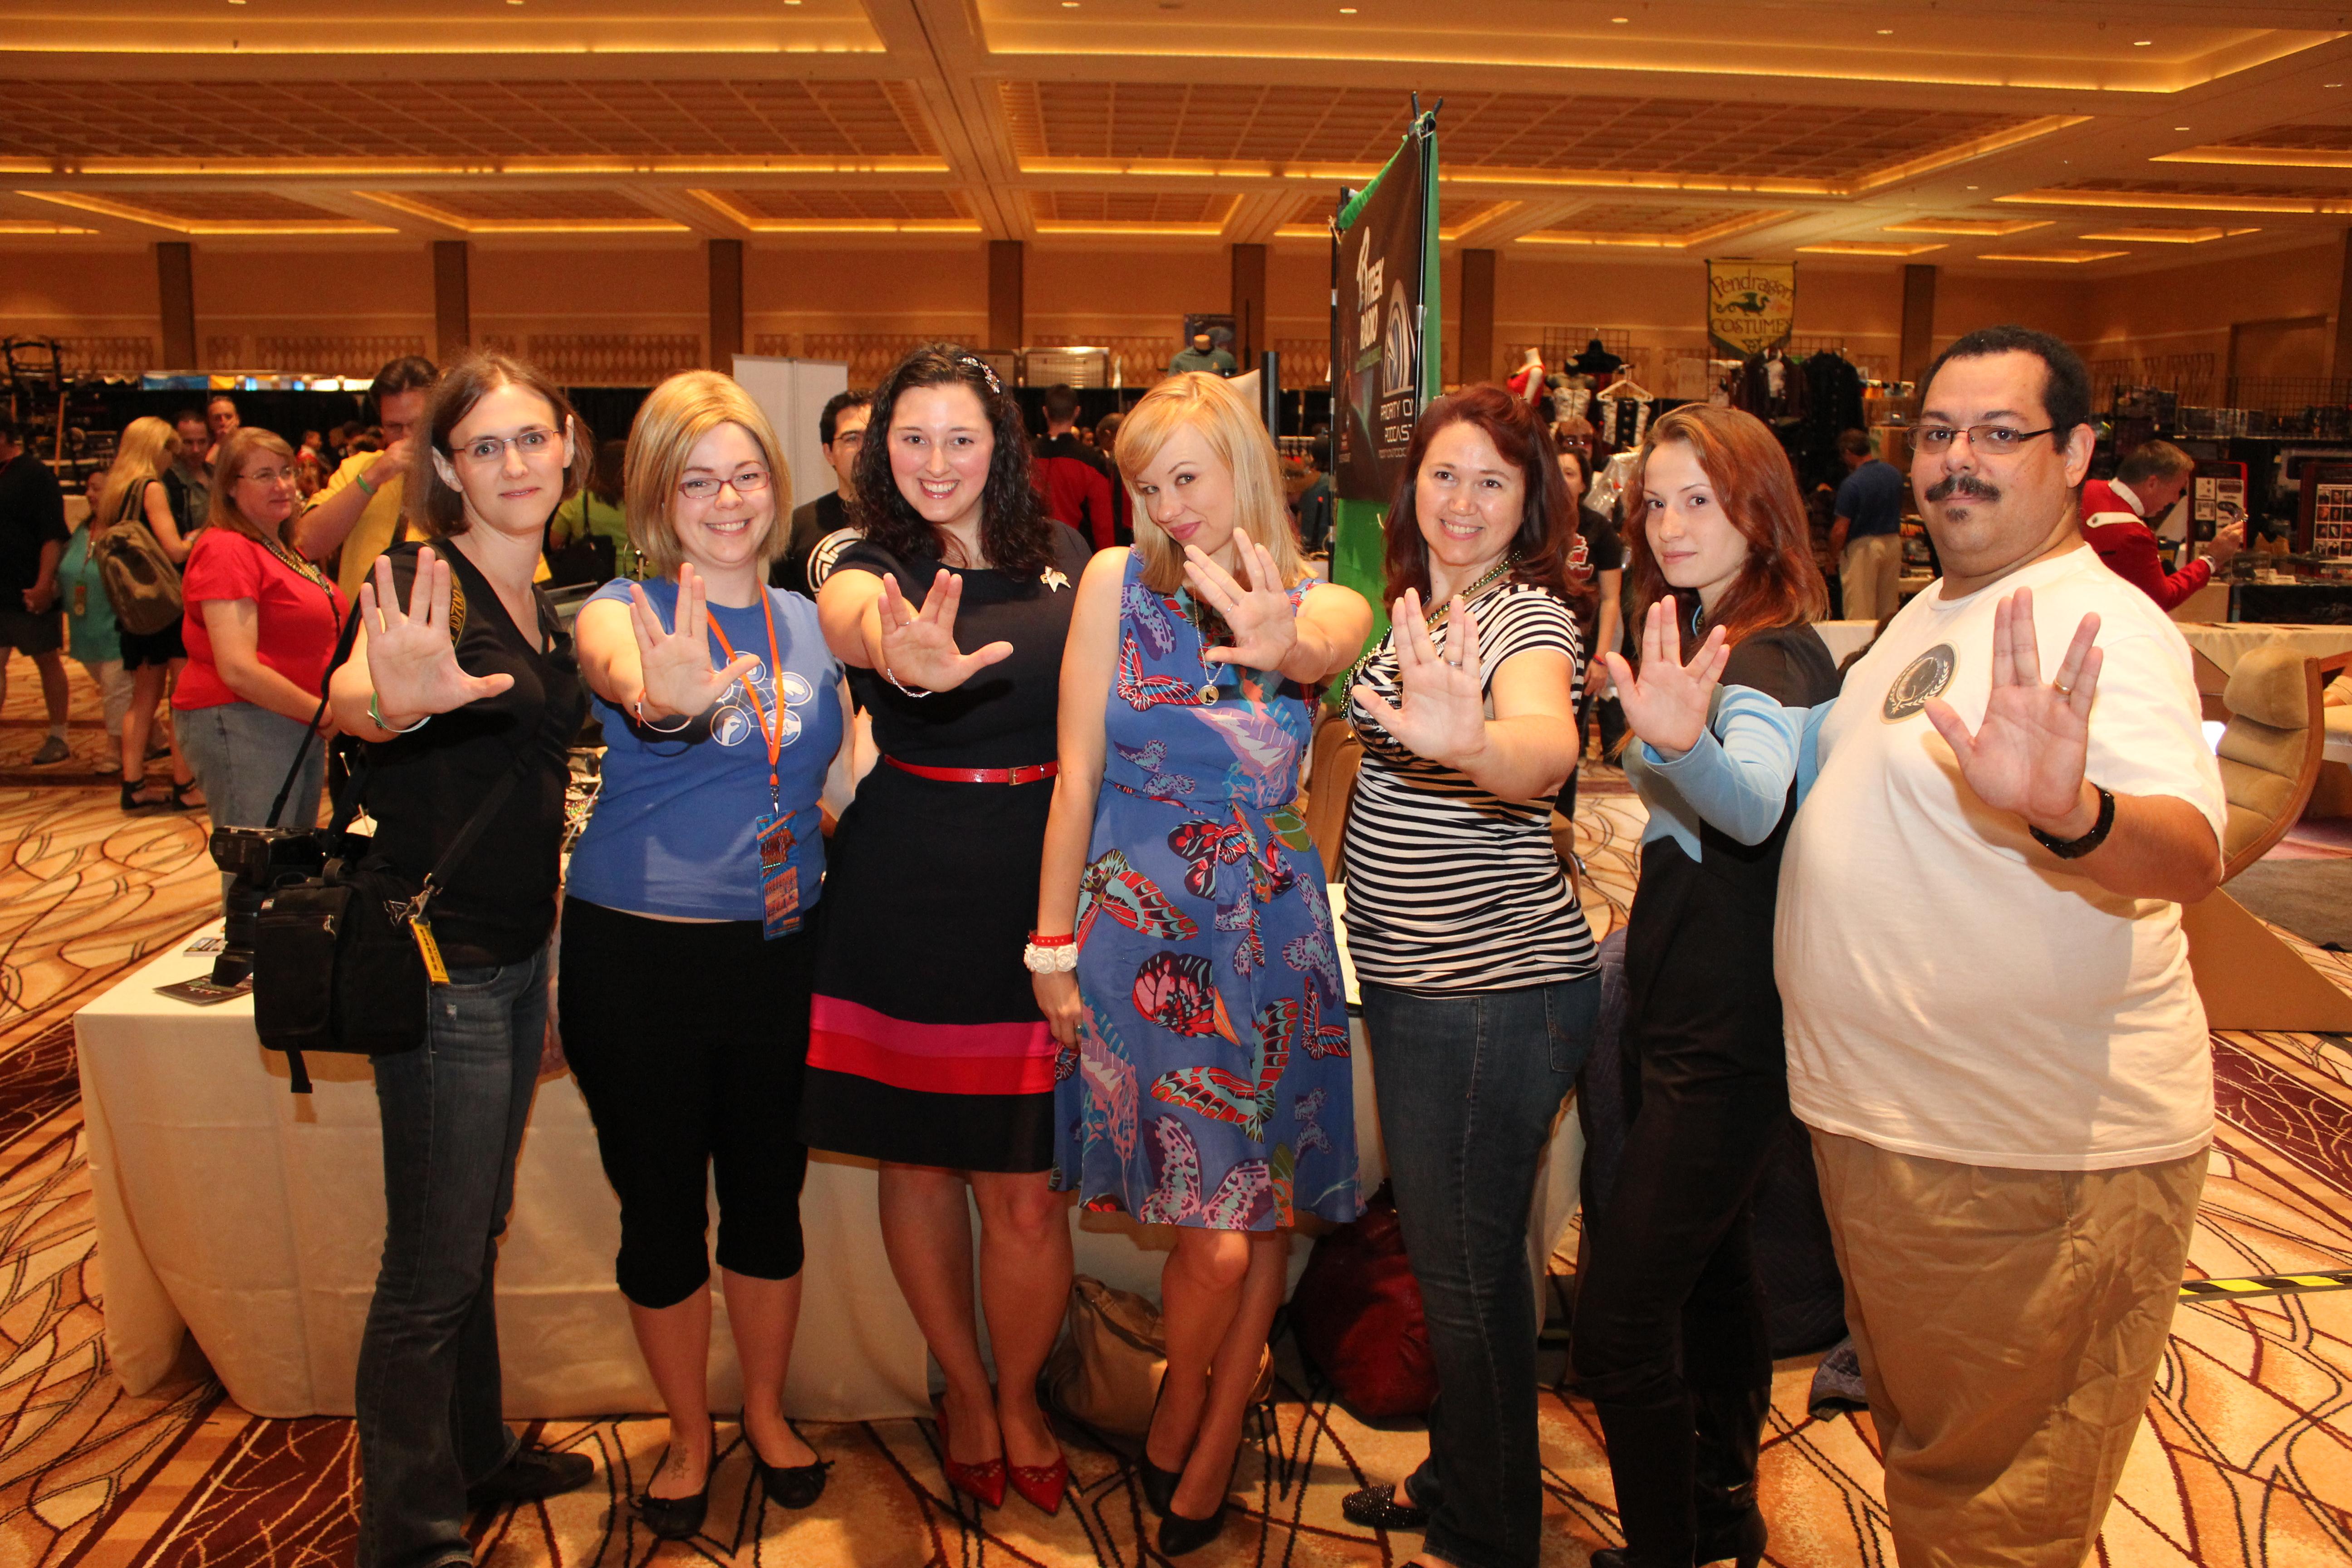 Group photo of our Star Trek women's panel